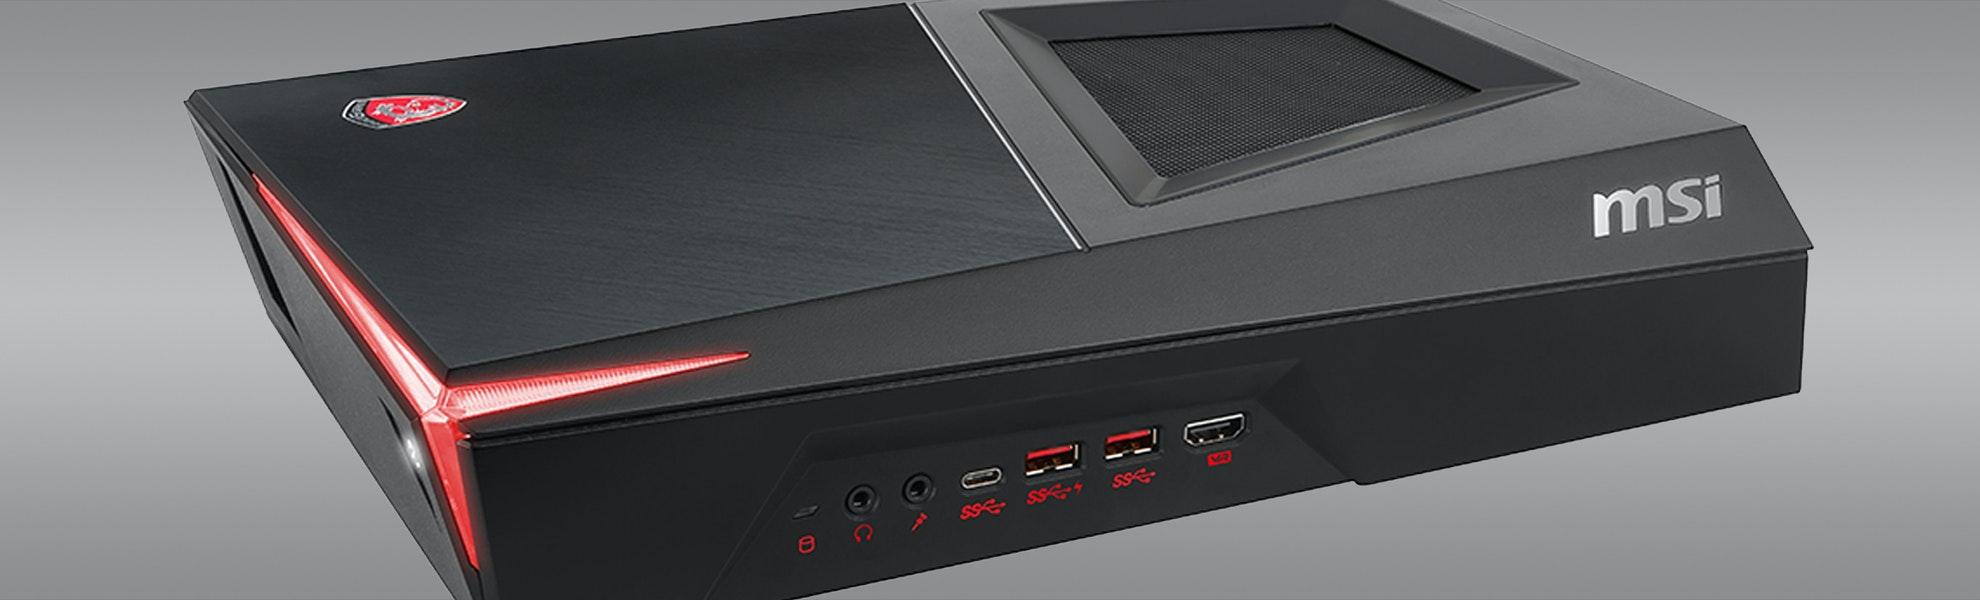 MSI Trident Mini Gaming PC